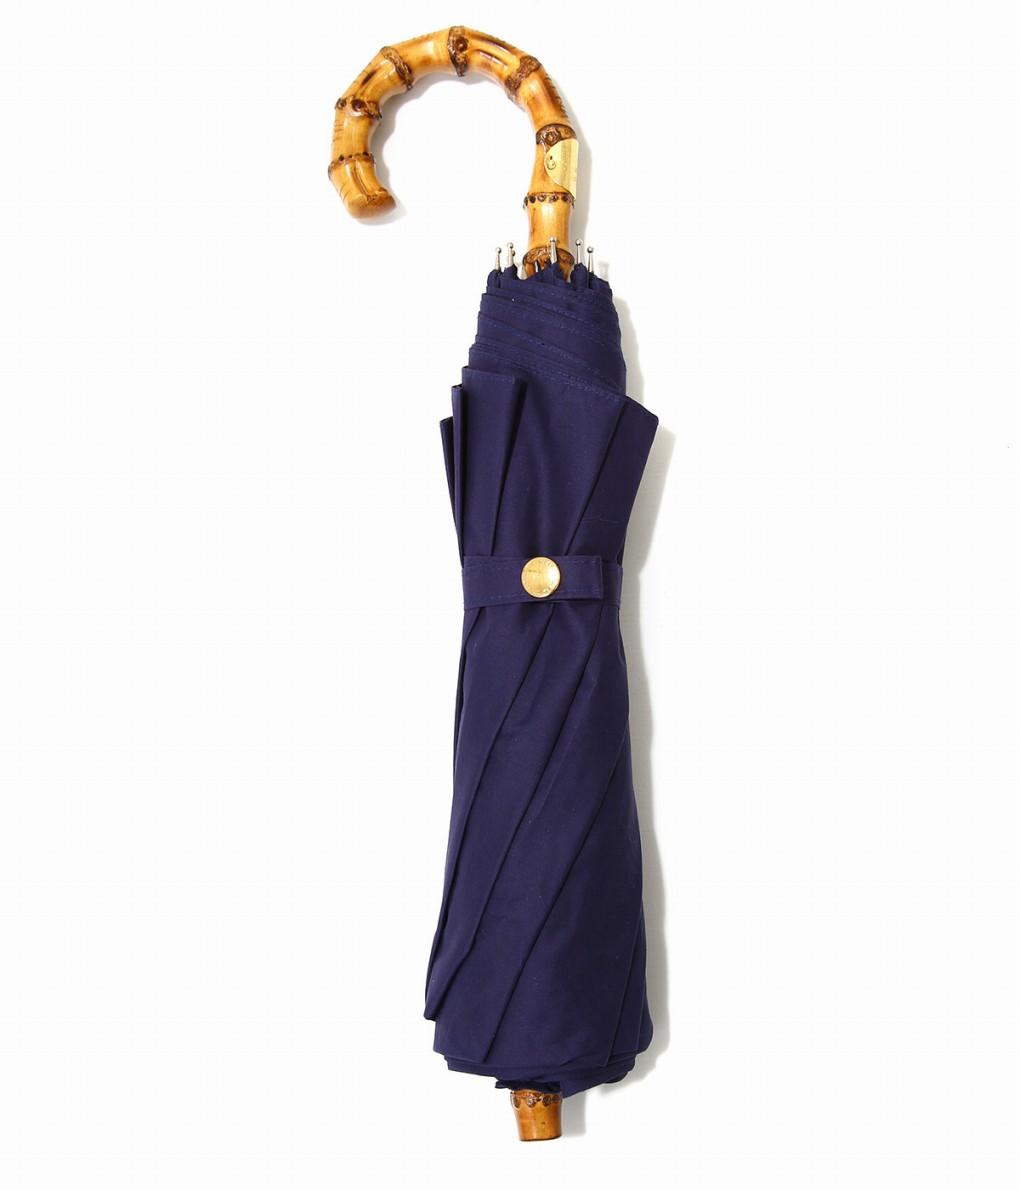 Traditional Weather Wear / トラディショナルウェザーウエア : FOLDING BAMBOO GLD / 全2色 : トラディショナルウェザーウェアー フォルディングバンブー 傘 レディース : A191MTGGO0068 【ANN】